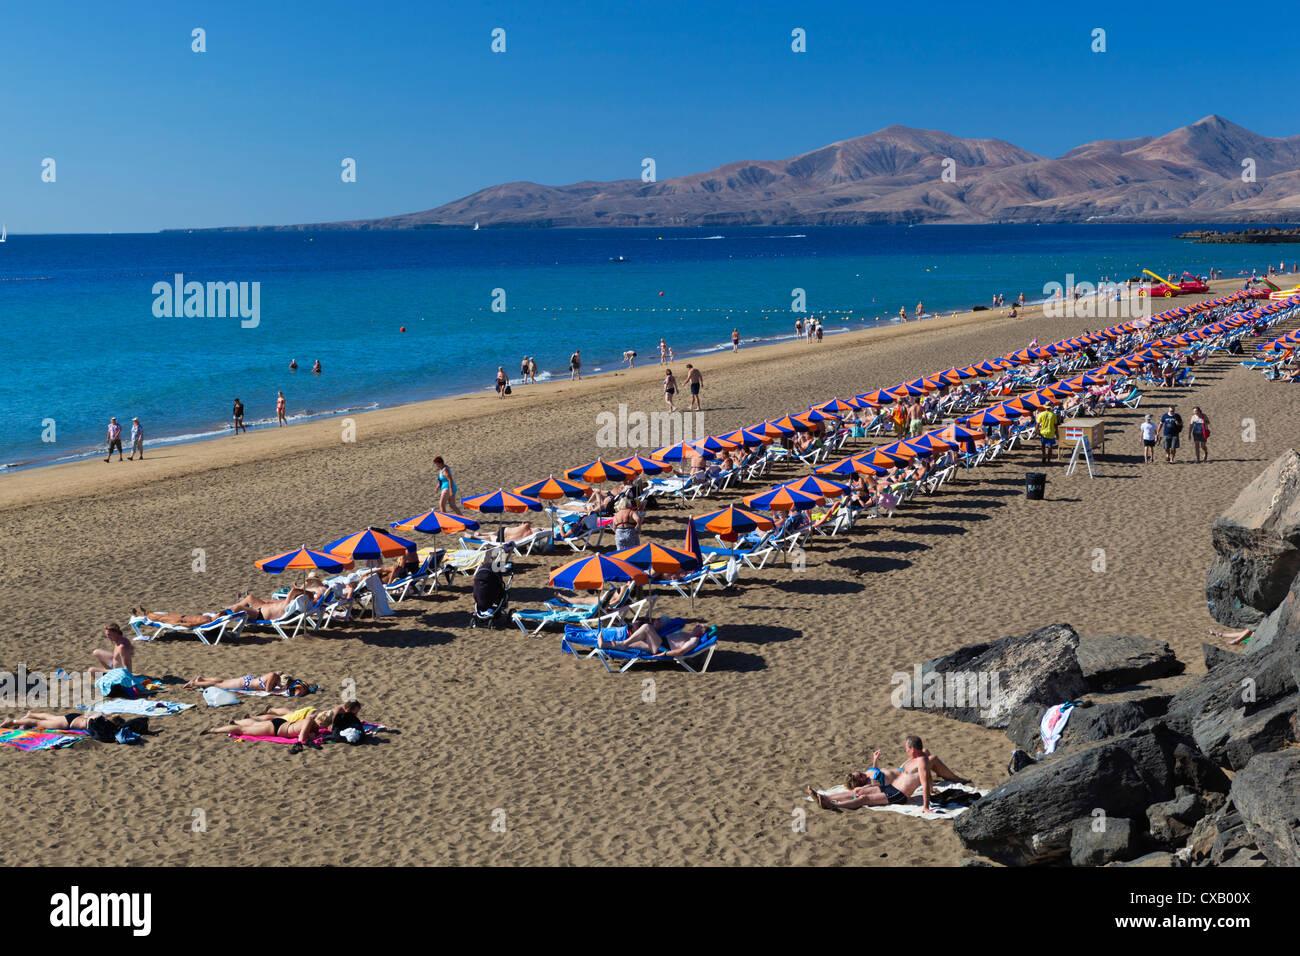 Playa Grande, Puerto del Carmen, Lanzarote, Kanarische Inseln, Spanien, Atlantik, Europa Stockbild